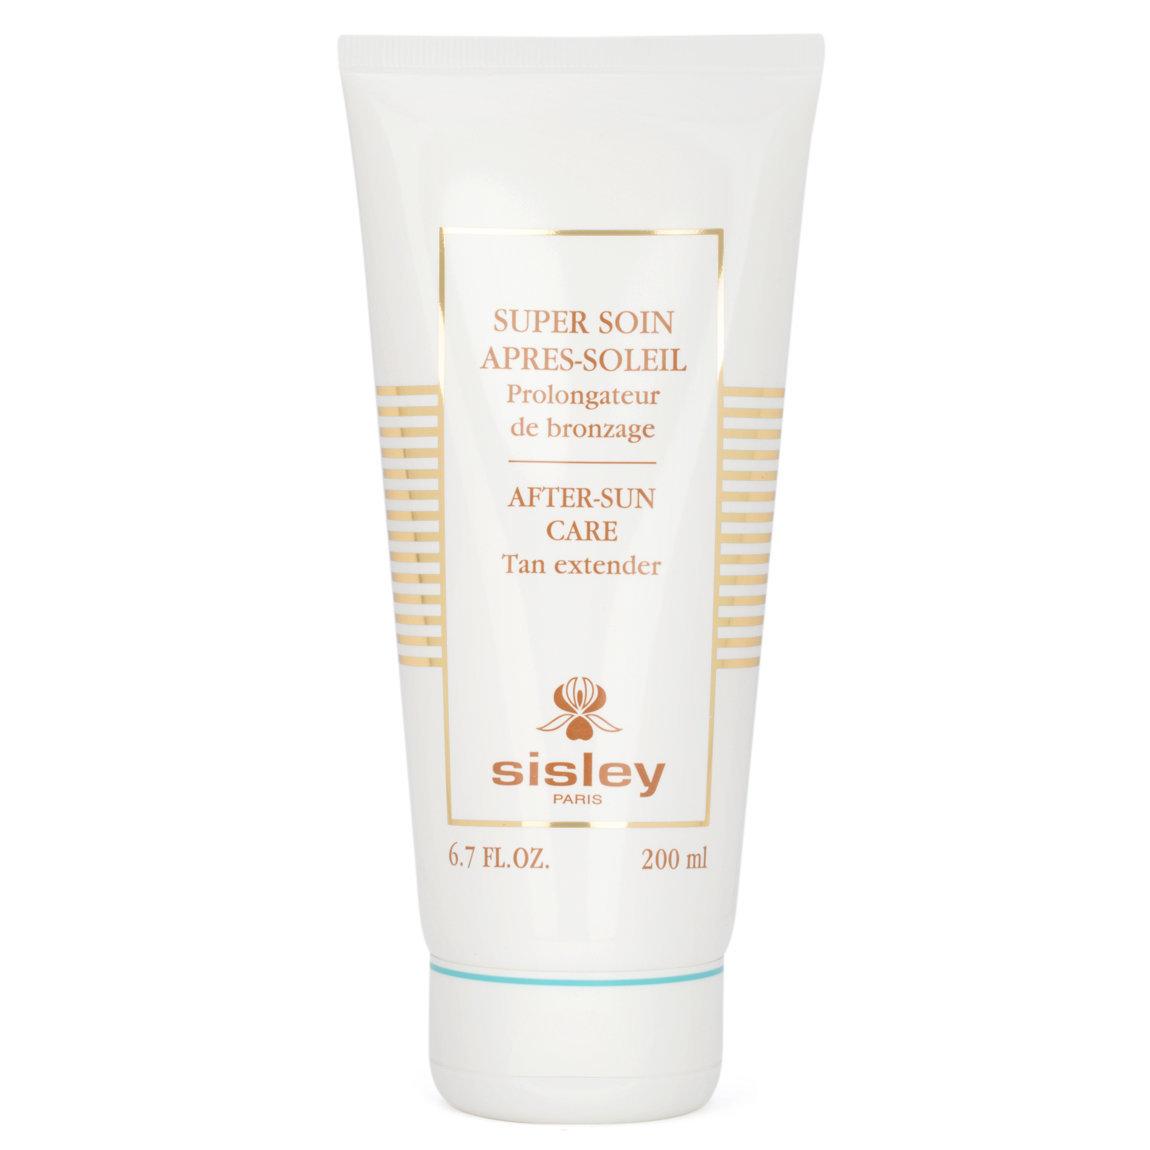 Sisley-Paris After-Sun Care Tan Extender alternative view 1 - product swatch.